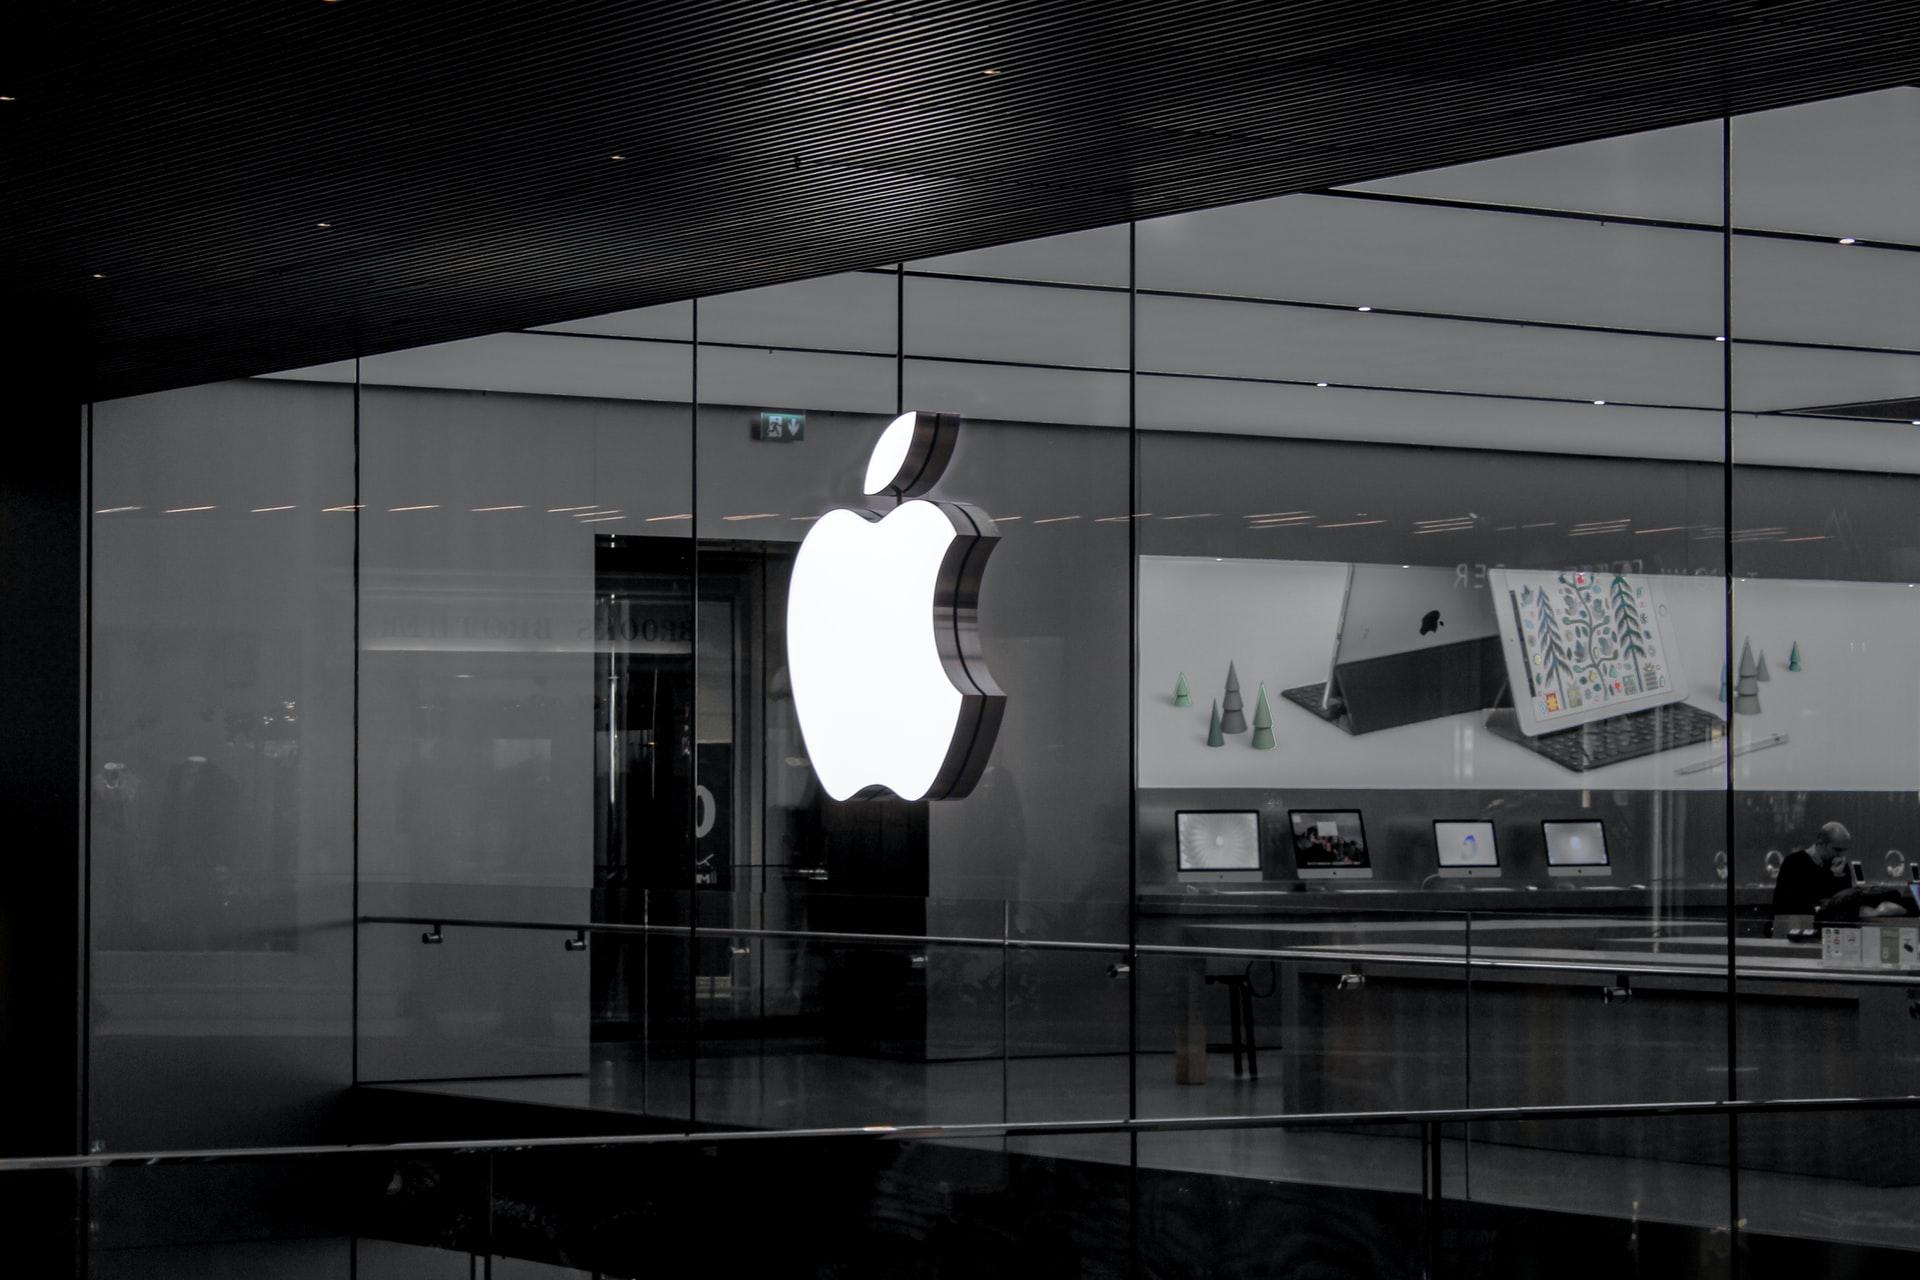 Apple Black Friday 2020 Deals on Best Buy